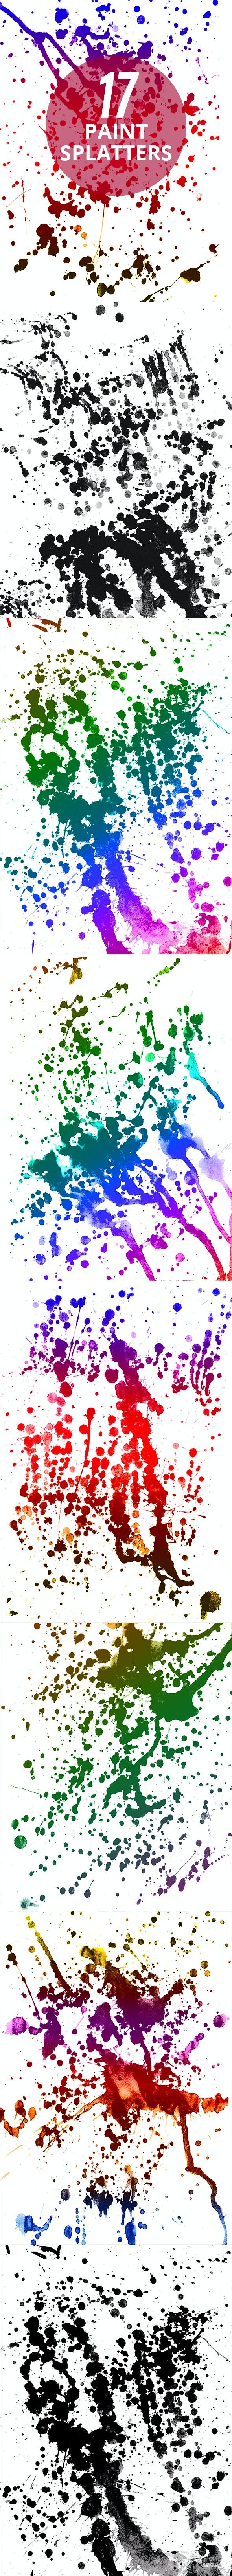 17 Authentic Paint Splatters Photoshop Brushes - Artistic Brushes